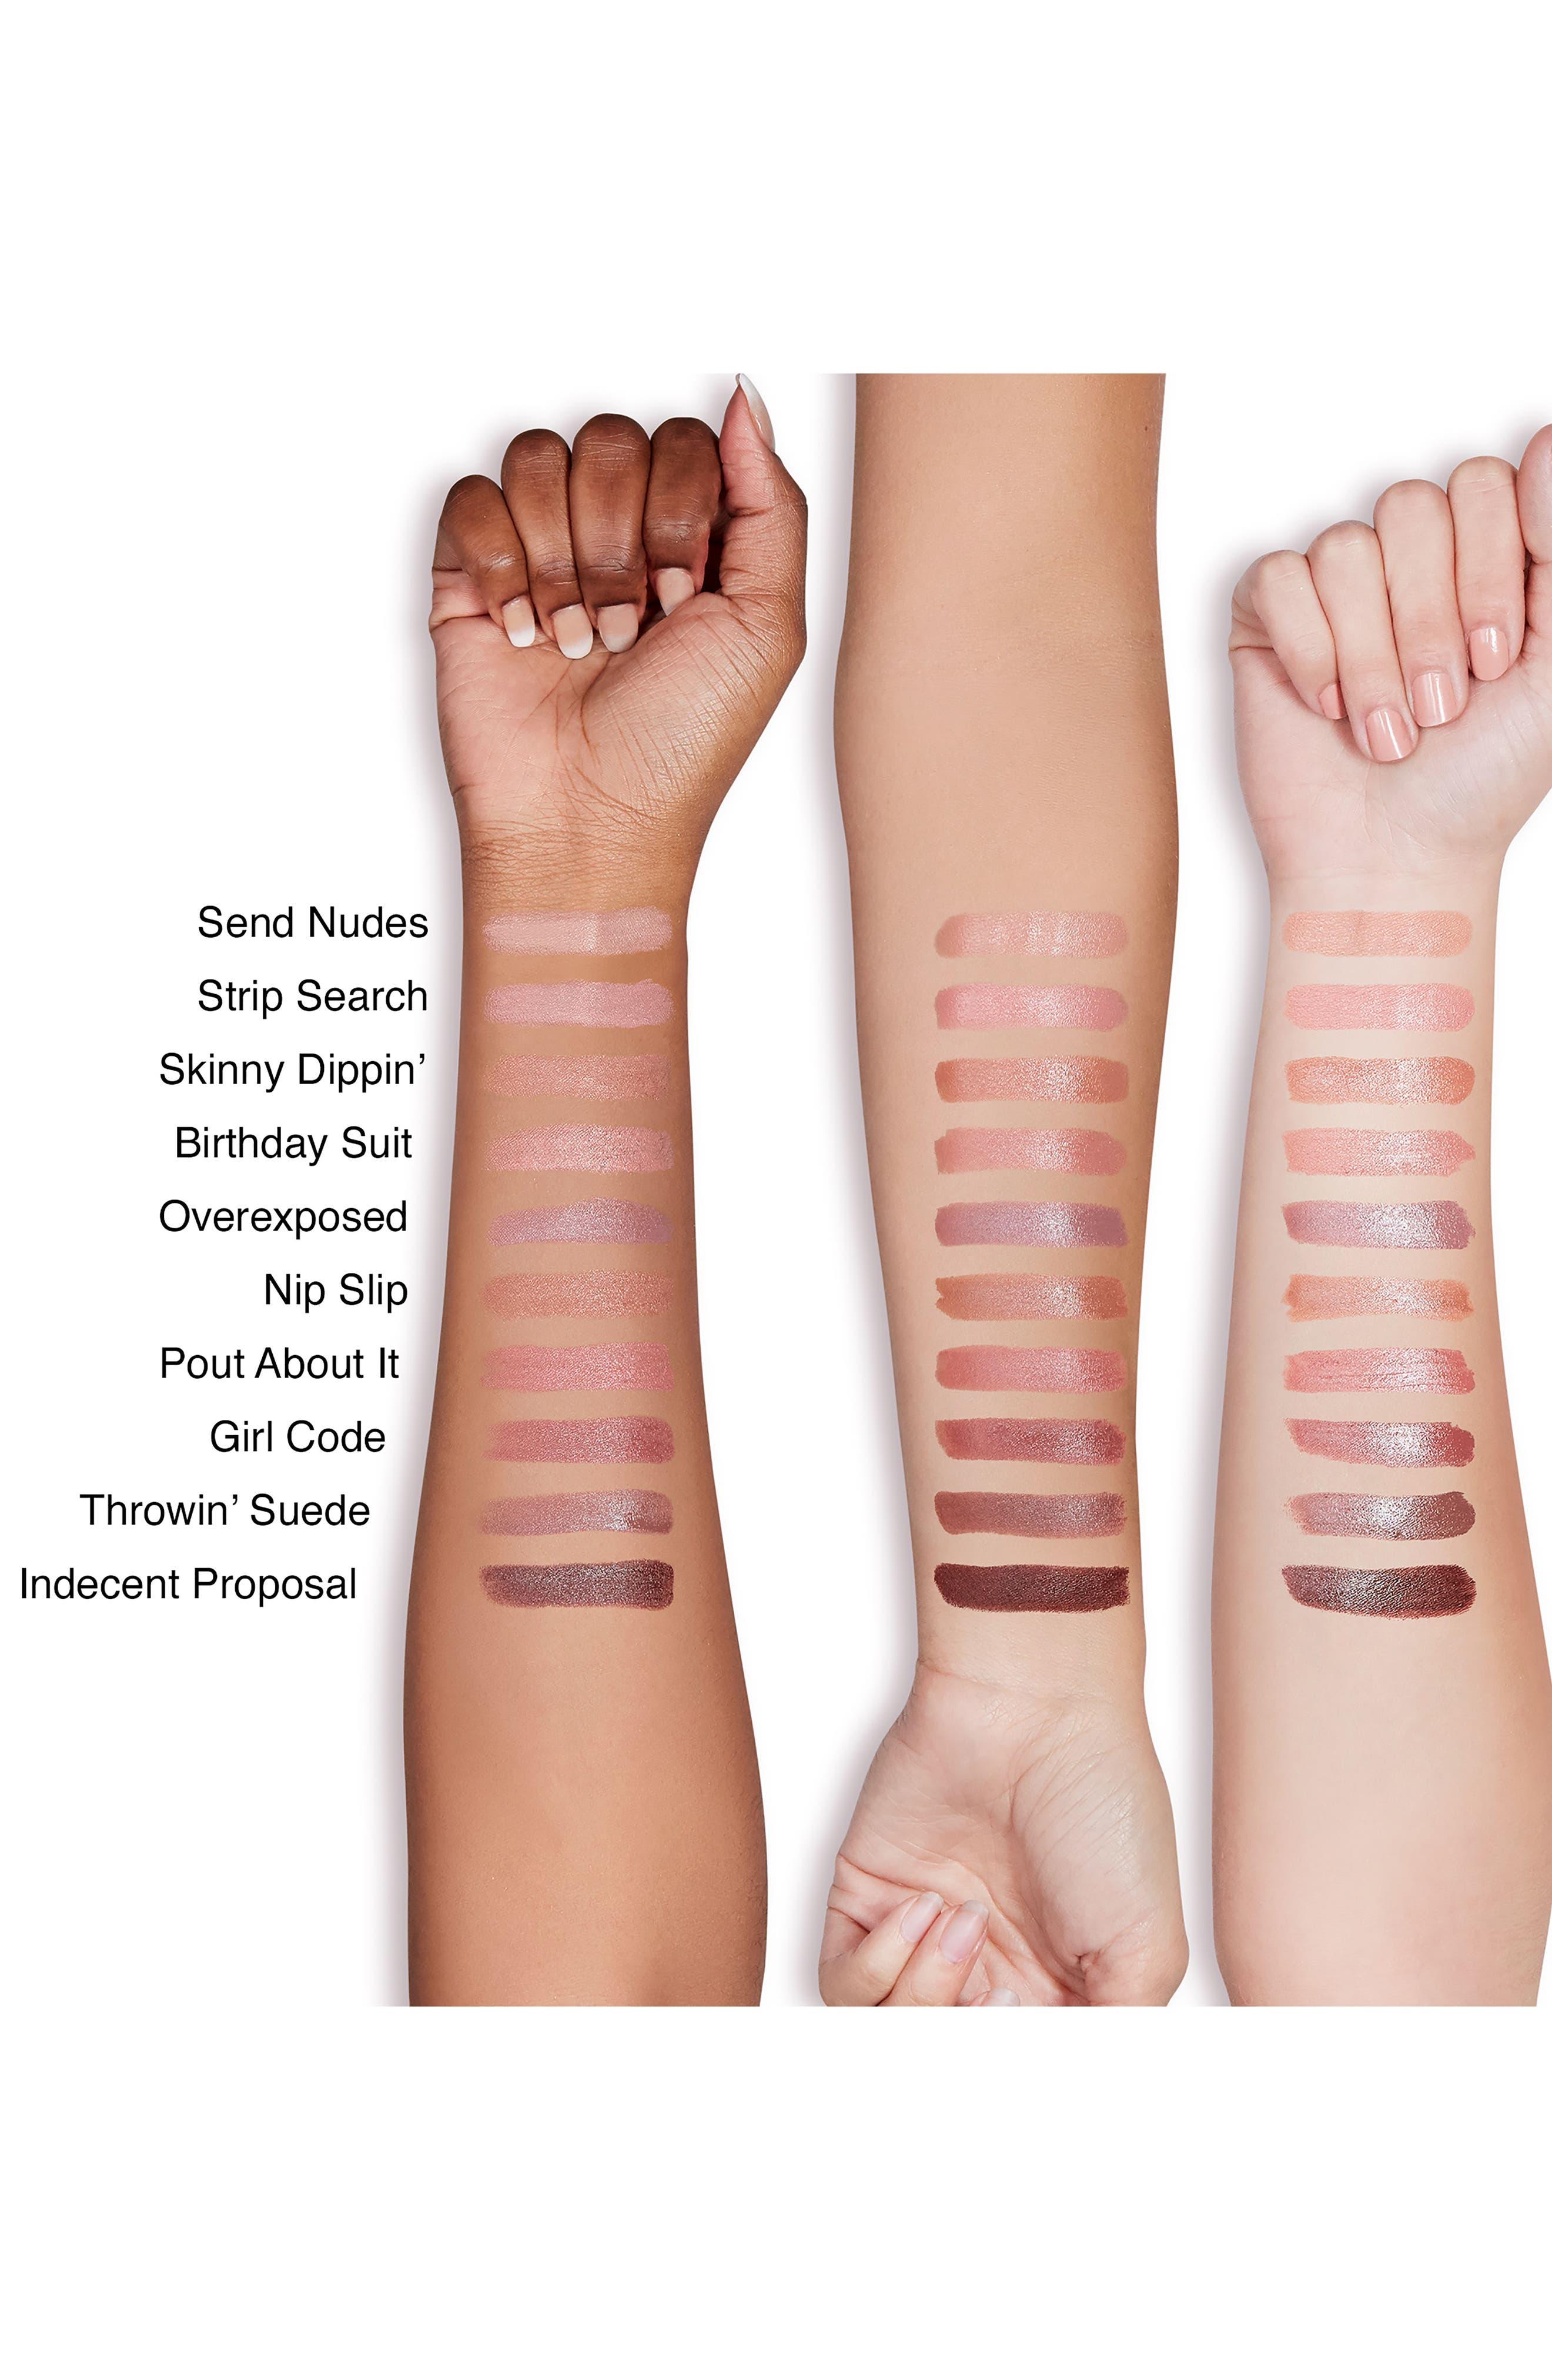 Natural Nudes Lipstick,                             Alternate thumbnail 8, color,                             NIP SLIP